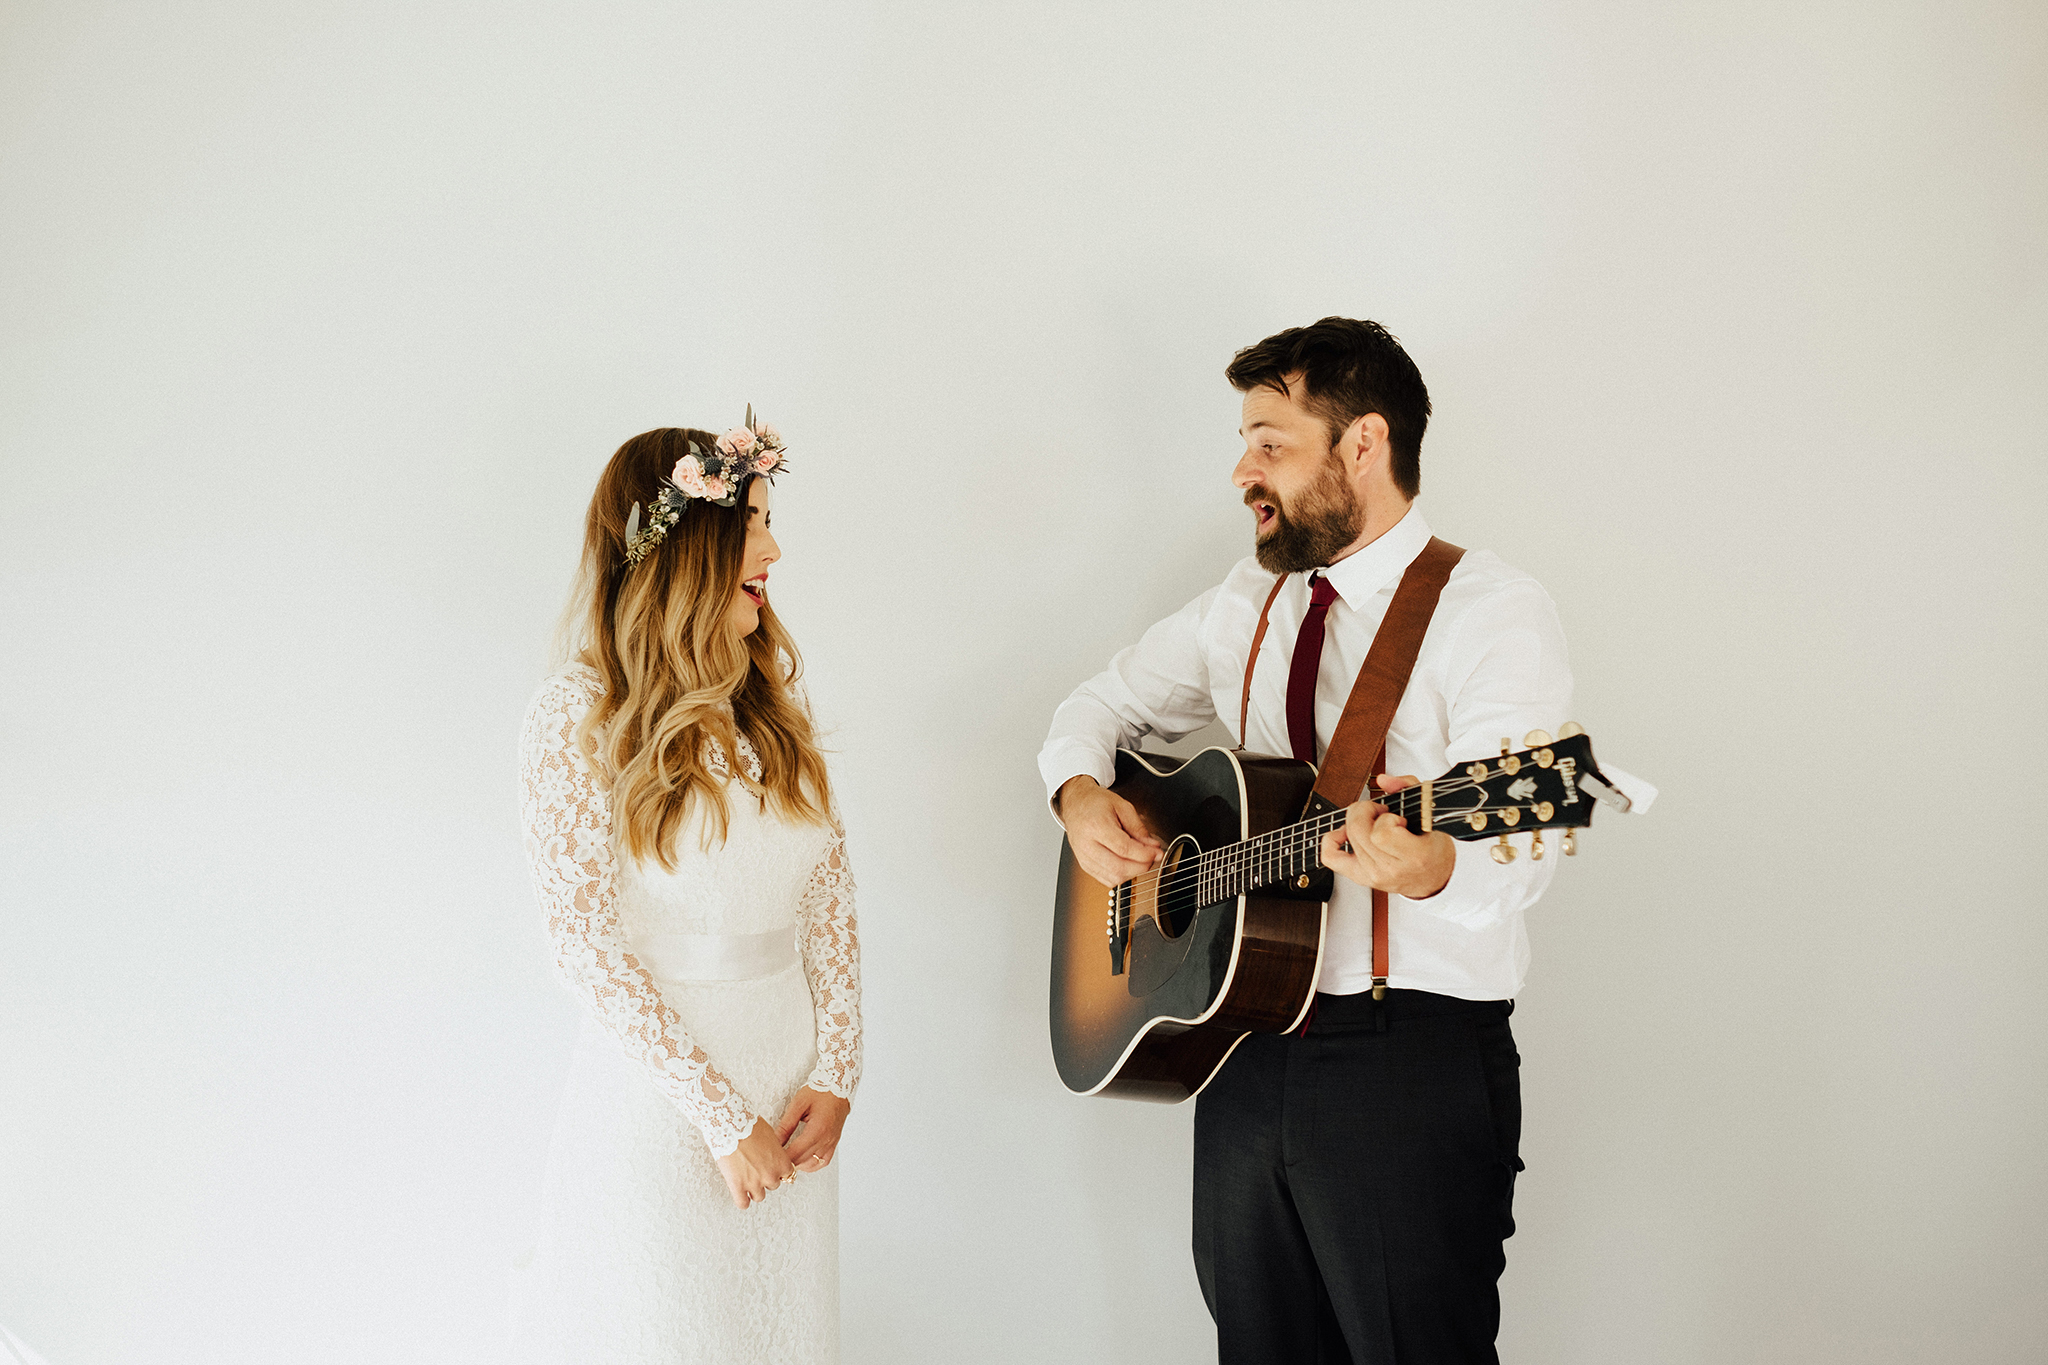 Arizona-Adventure-Elopement-Wedding-Photographer-73.jpg